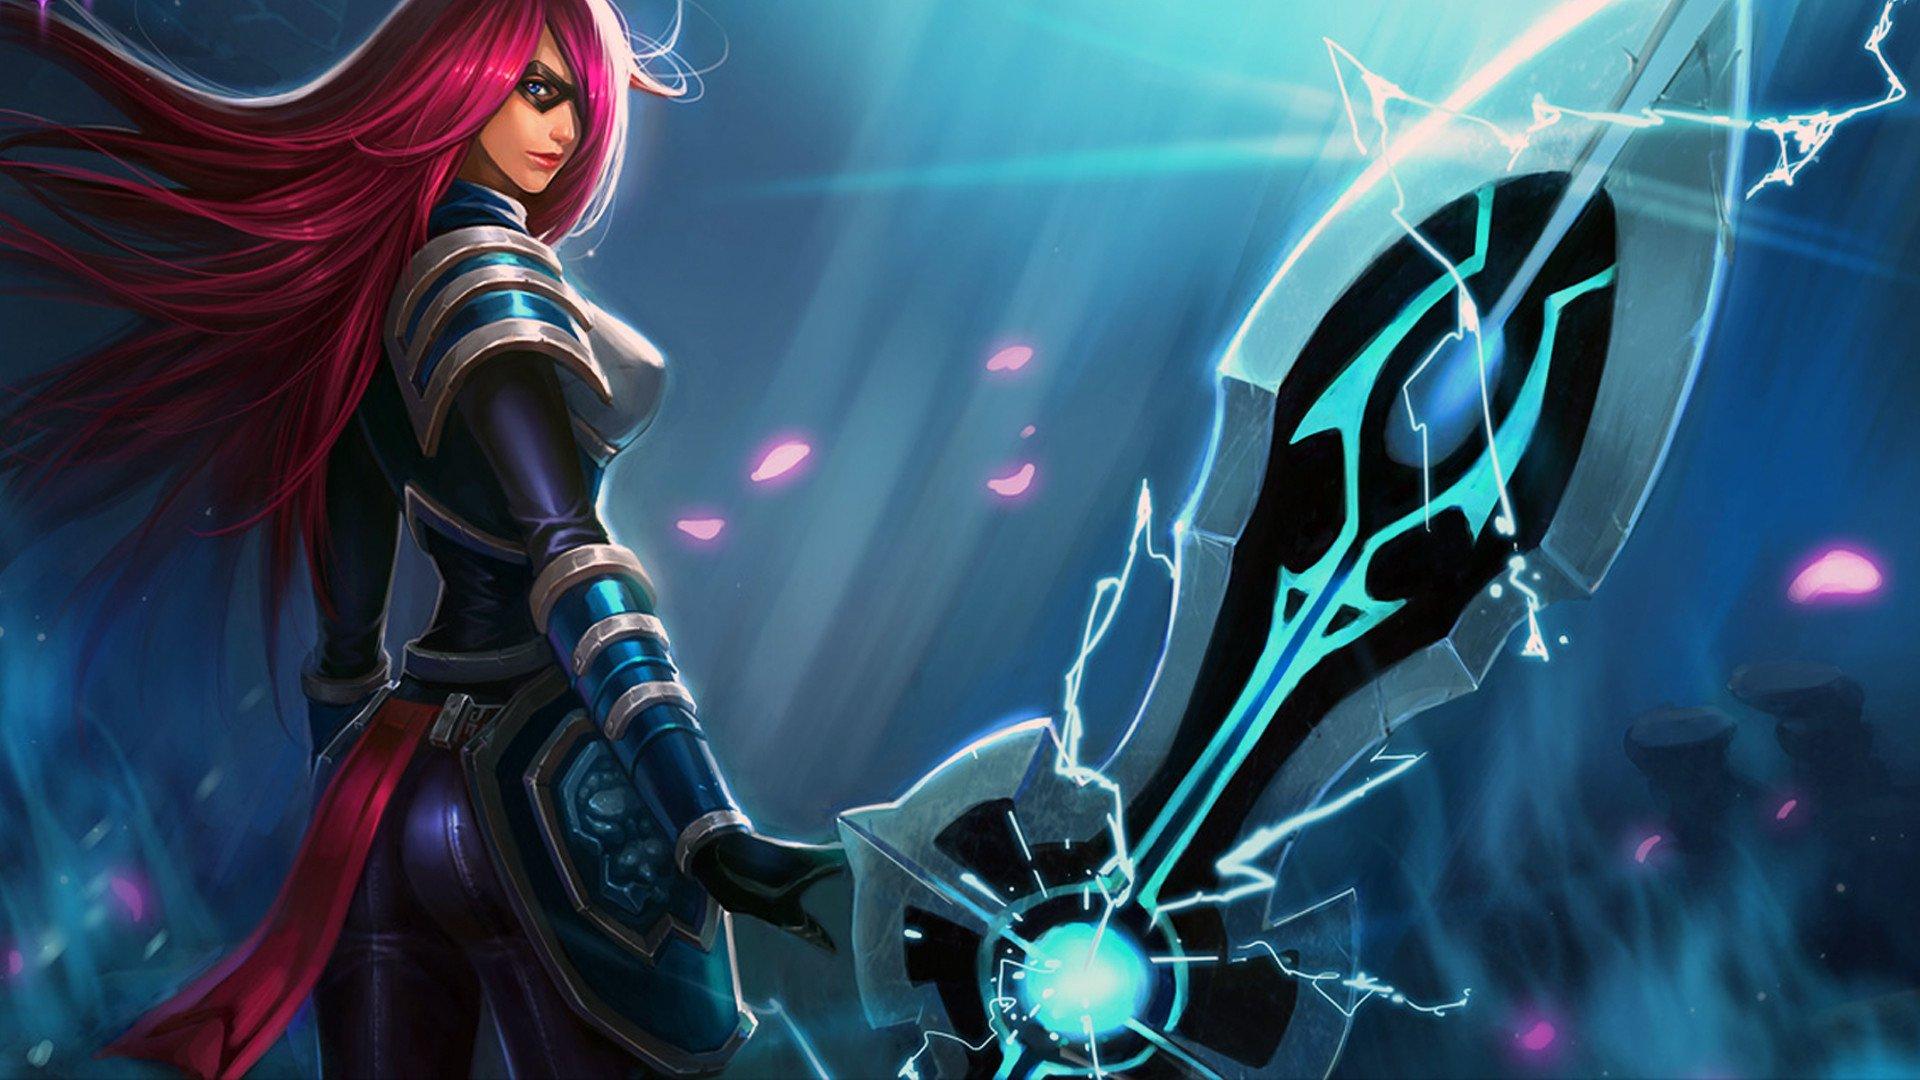 Vídeo Game - League Of Legends  Pink Hair Fantasia Garota Woman Warrior Long Hair Armor Irelia (League Of Legends) Weapon Papel de Parede